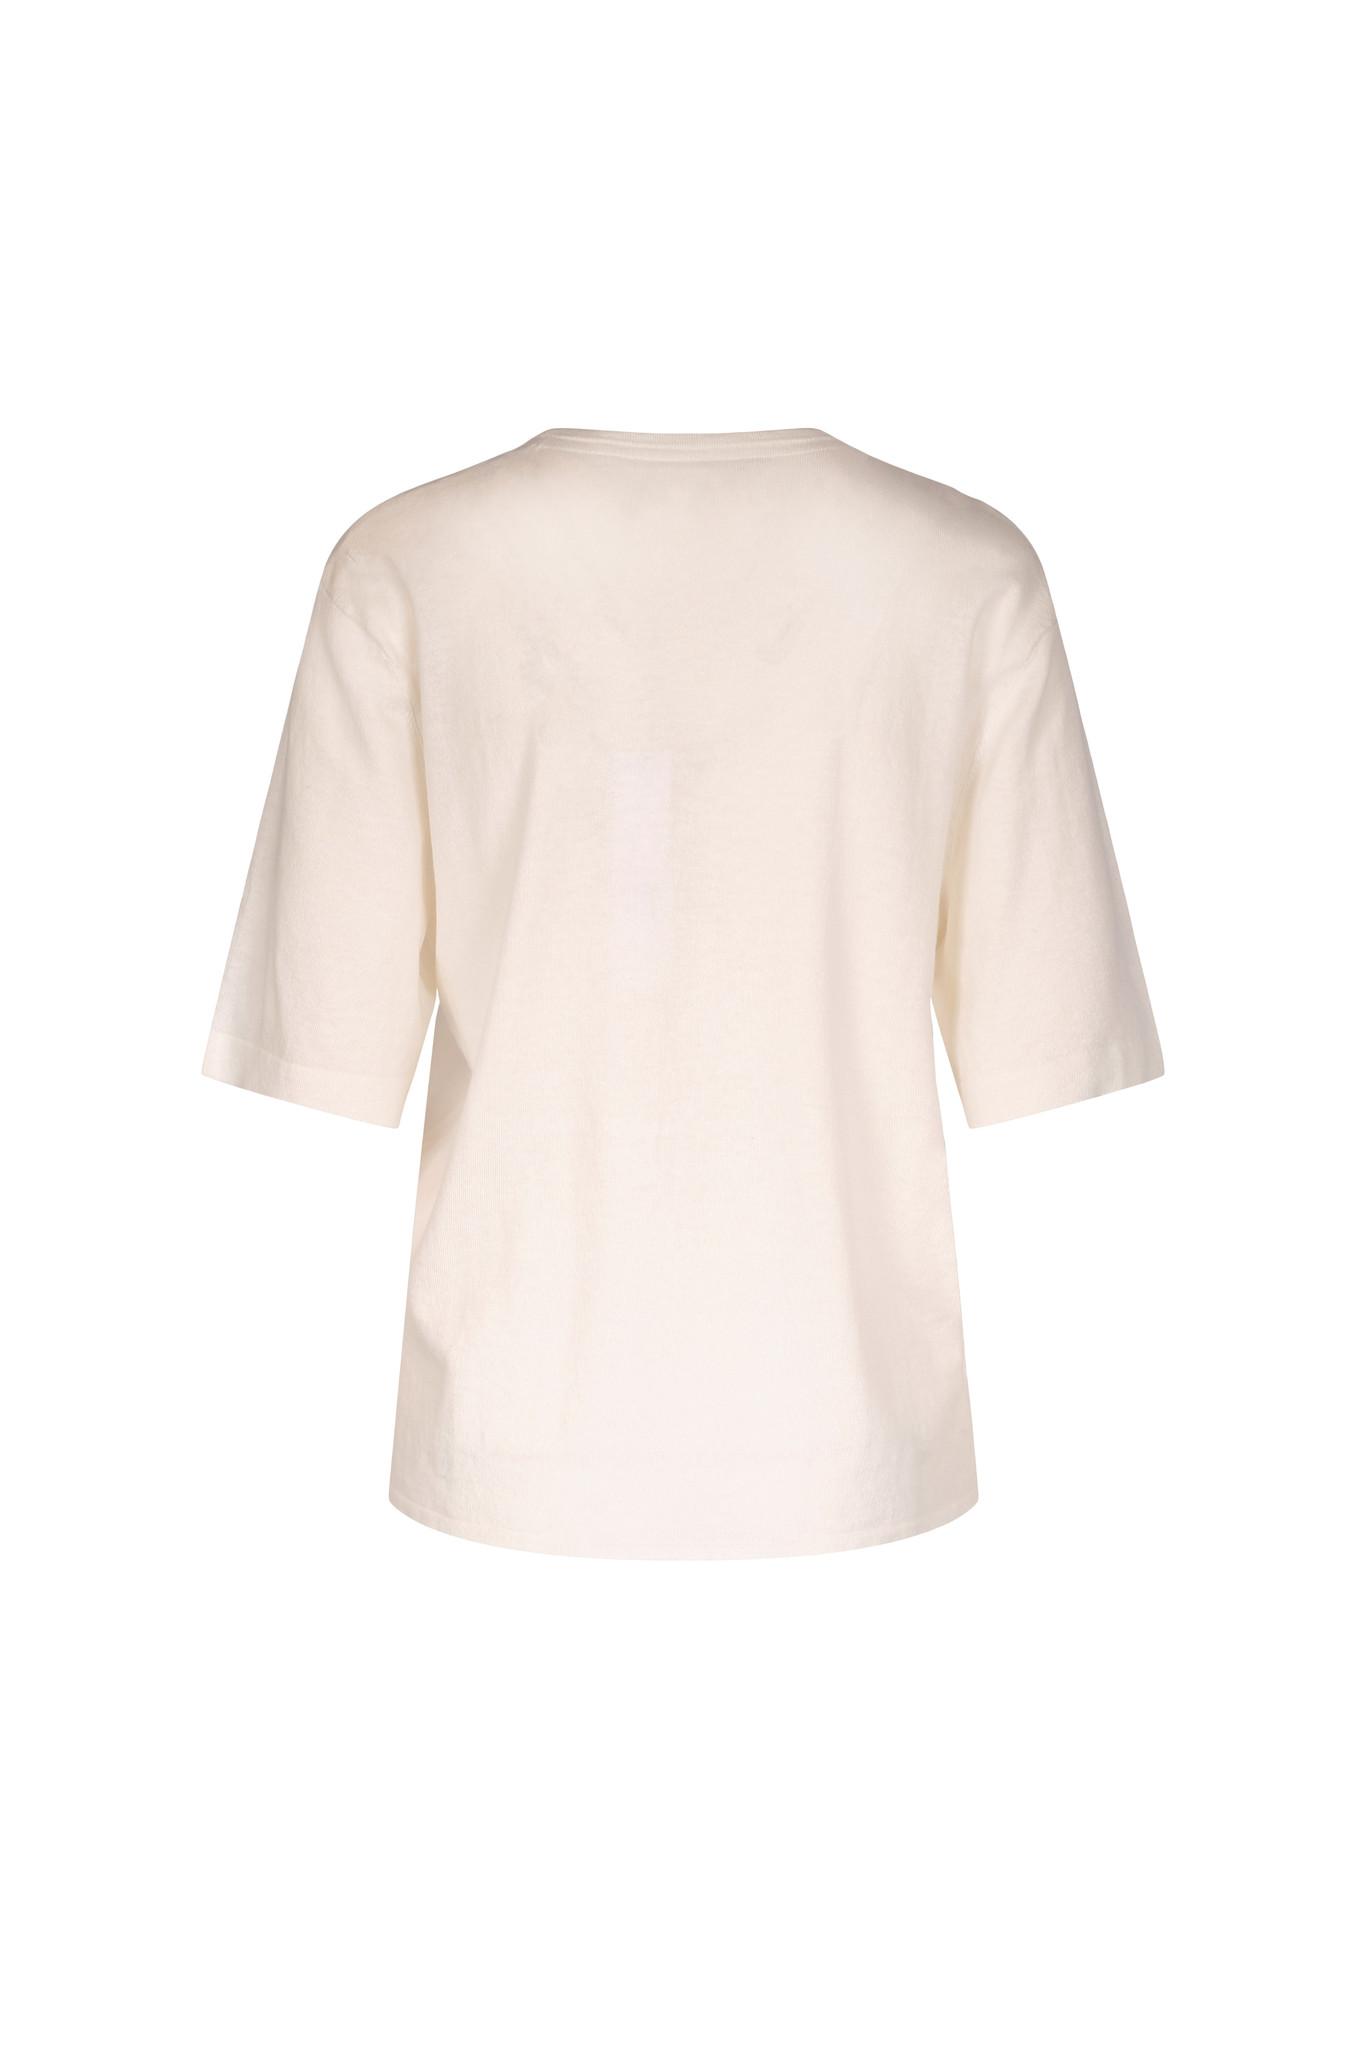 Joe Knitted Tee - Off White-2